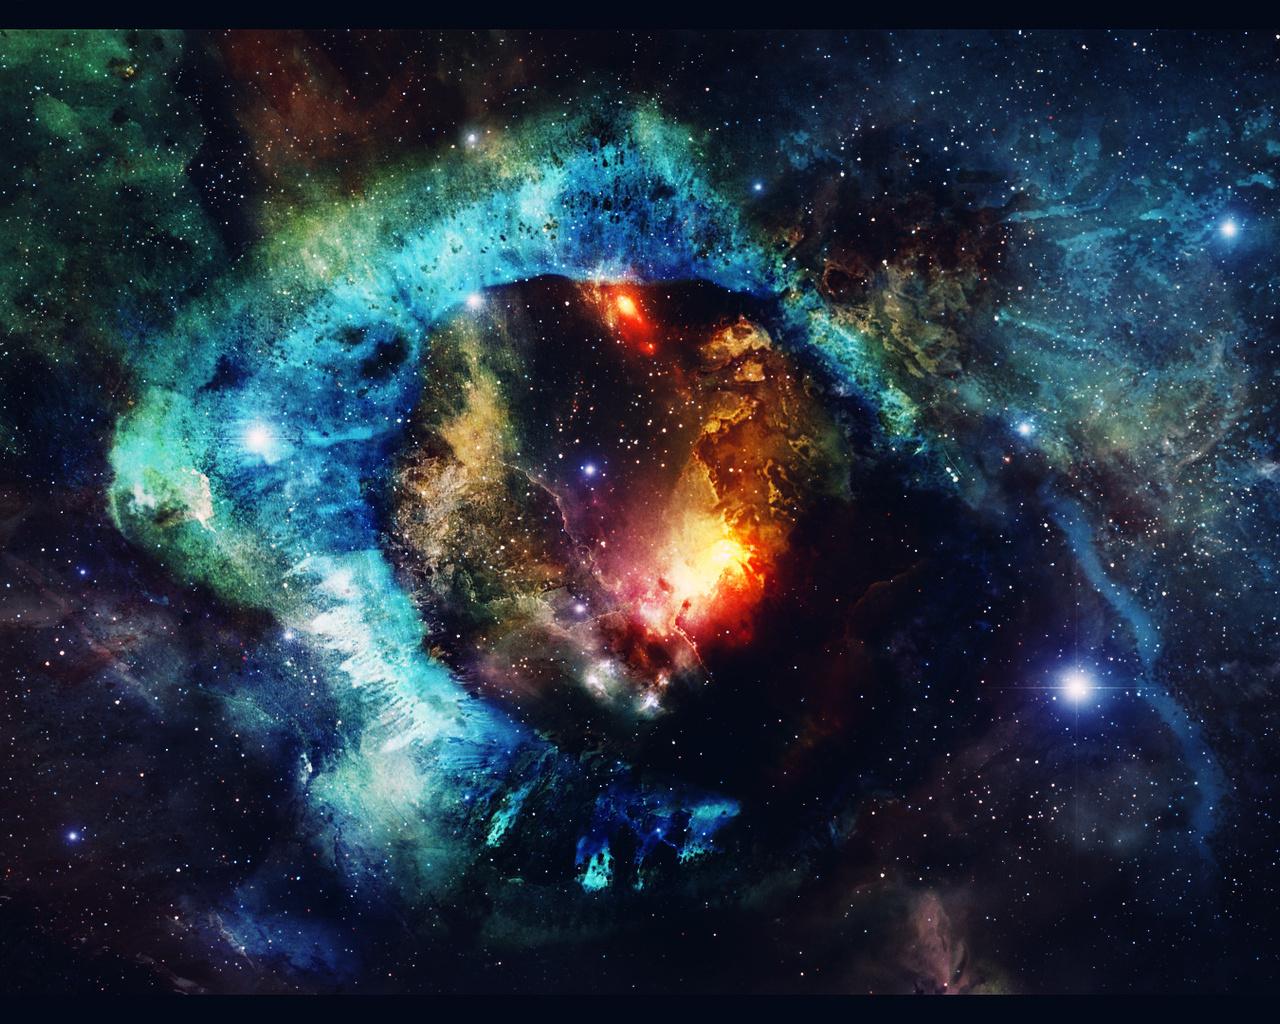 туманность, арт, universe, Космос, art, звезды, space, nebula, stars